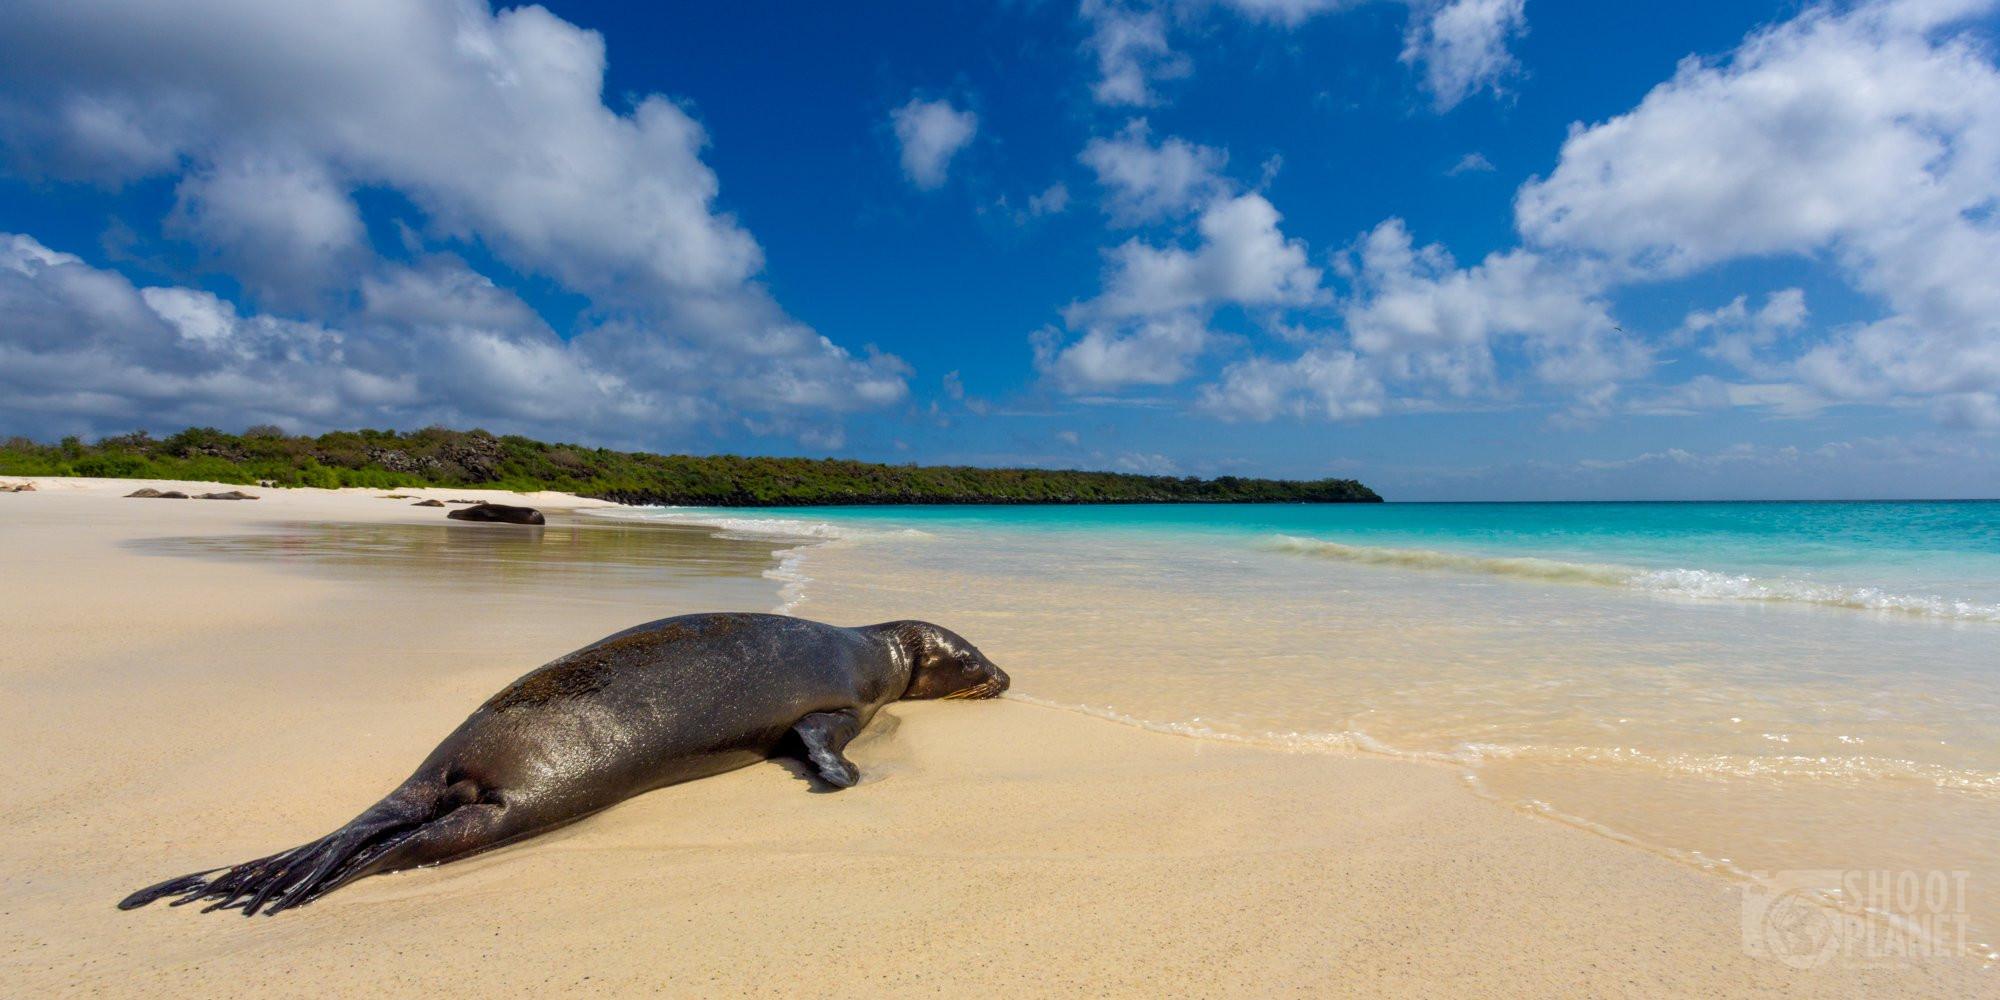 Loin seal sunbath, Espanola Island, Galapagos